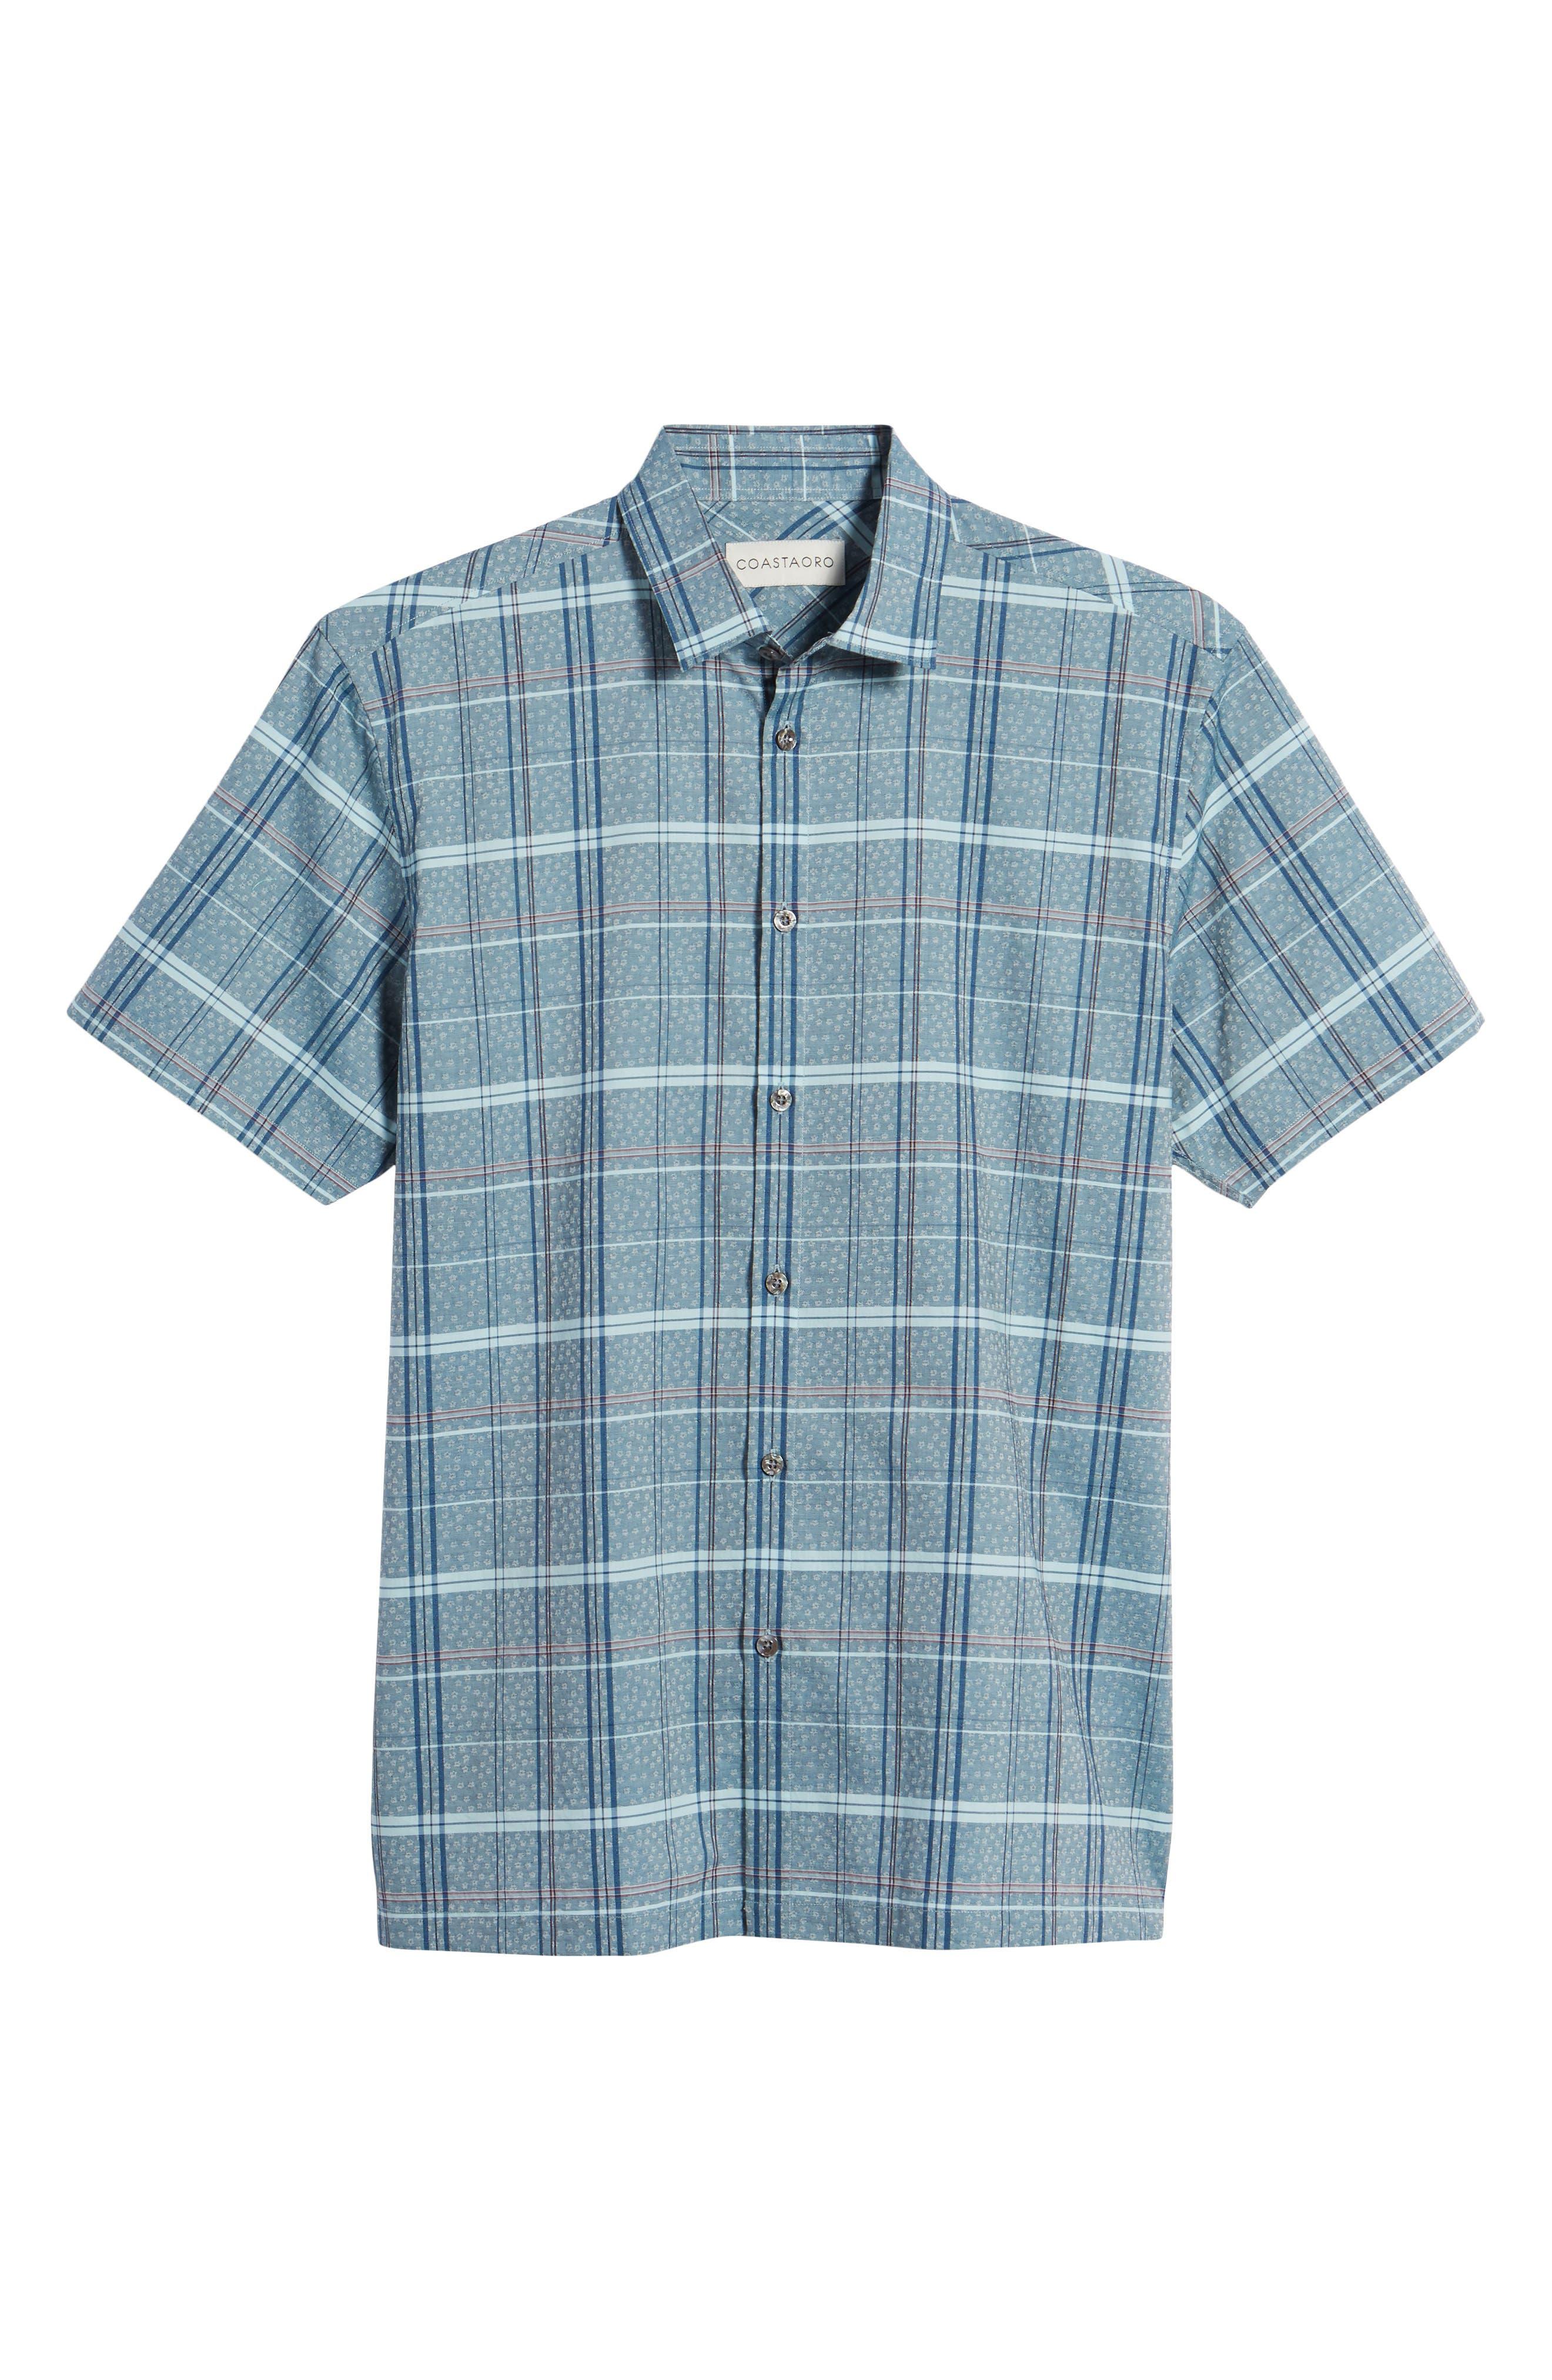 Vacaso Regular Fit Plaid Jacquard Sport Shirt,                             Alternate thumbnail 6, color,                             Water